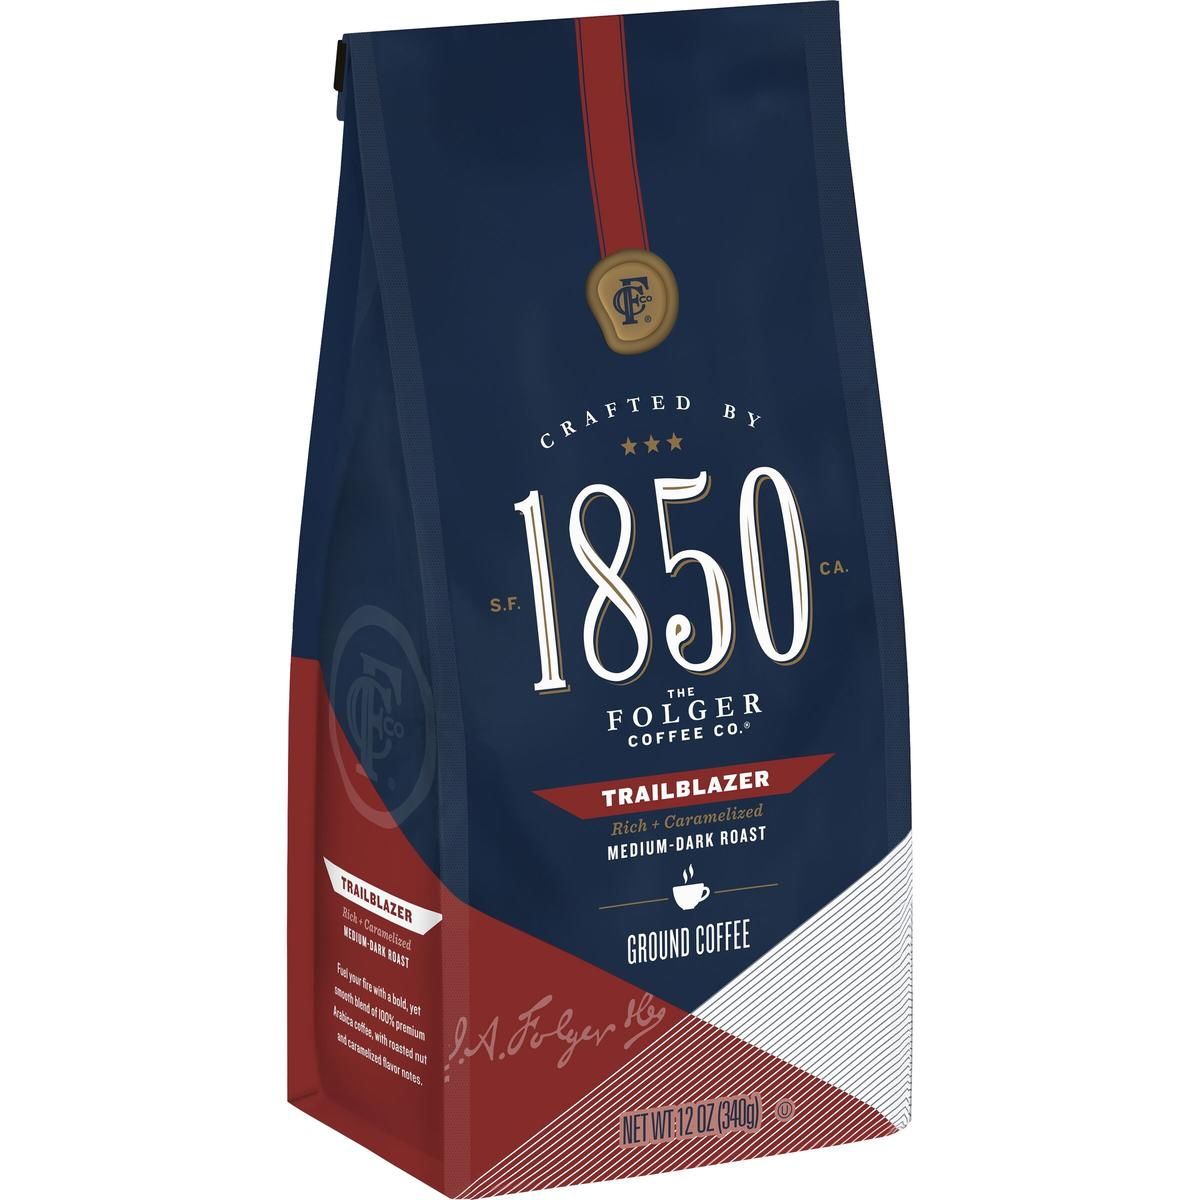 Folgers 1850 medium dark coffee, Trailblazer variety, 12oz bag of ground coffee